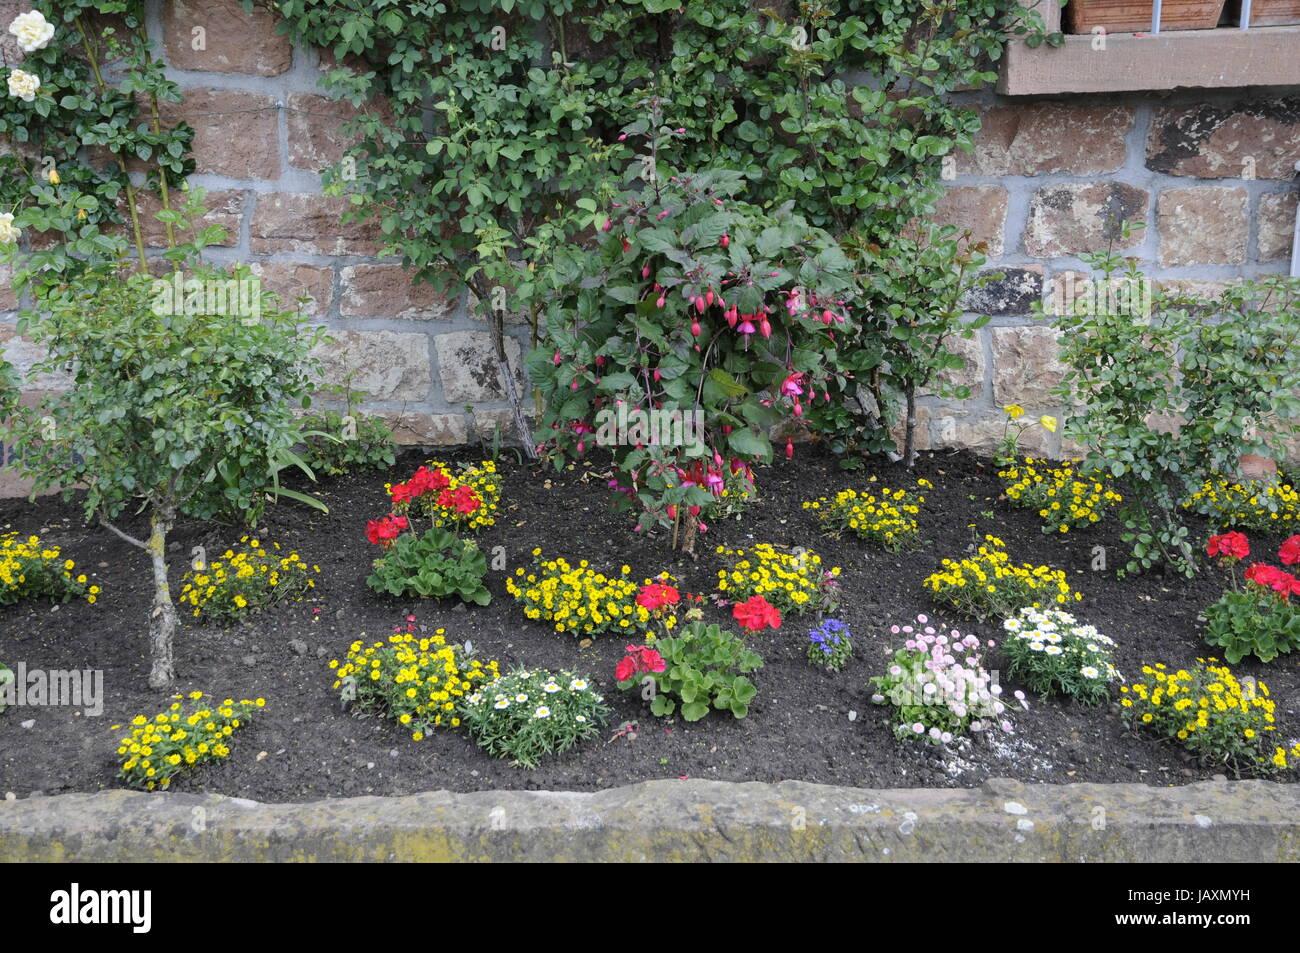 Blumenrabatte Rabatte Blumen Zierpflanzen Garten Park Stock